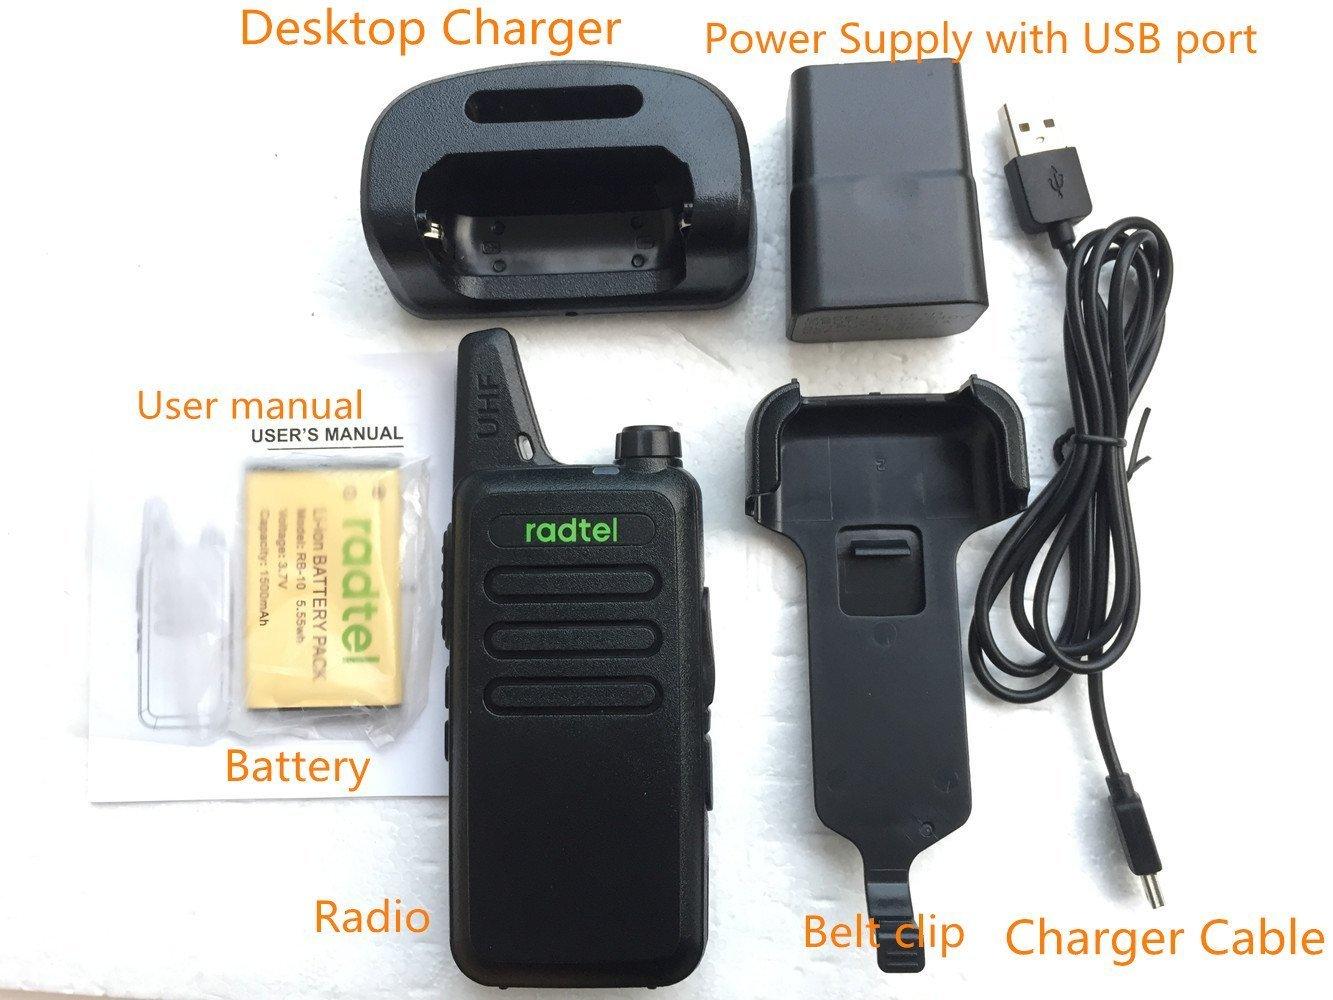 Radtel RT-10 Mini Two Way Radio UHF 400-470Mhz 3W Kid's Walkie Talkie , for Outdoor Camping Hiking Hunting Gift (10 Pack) by radtel (Image #7)